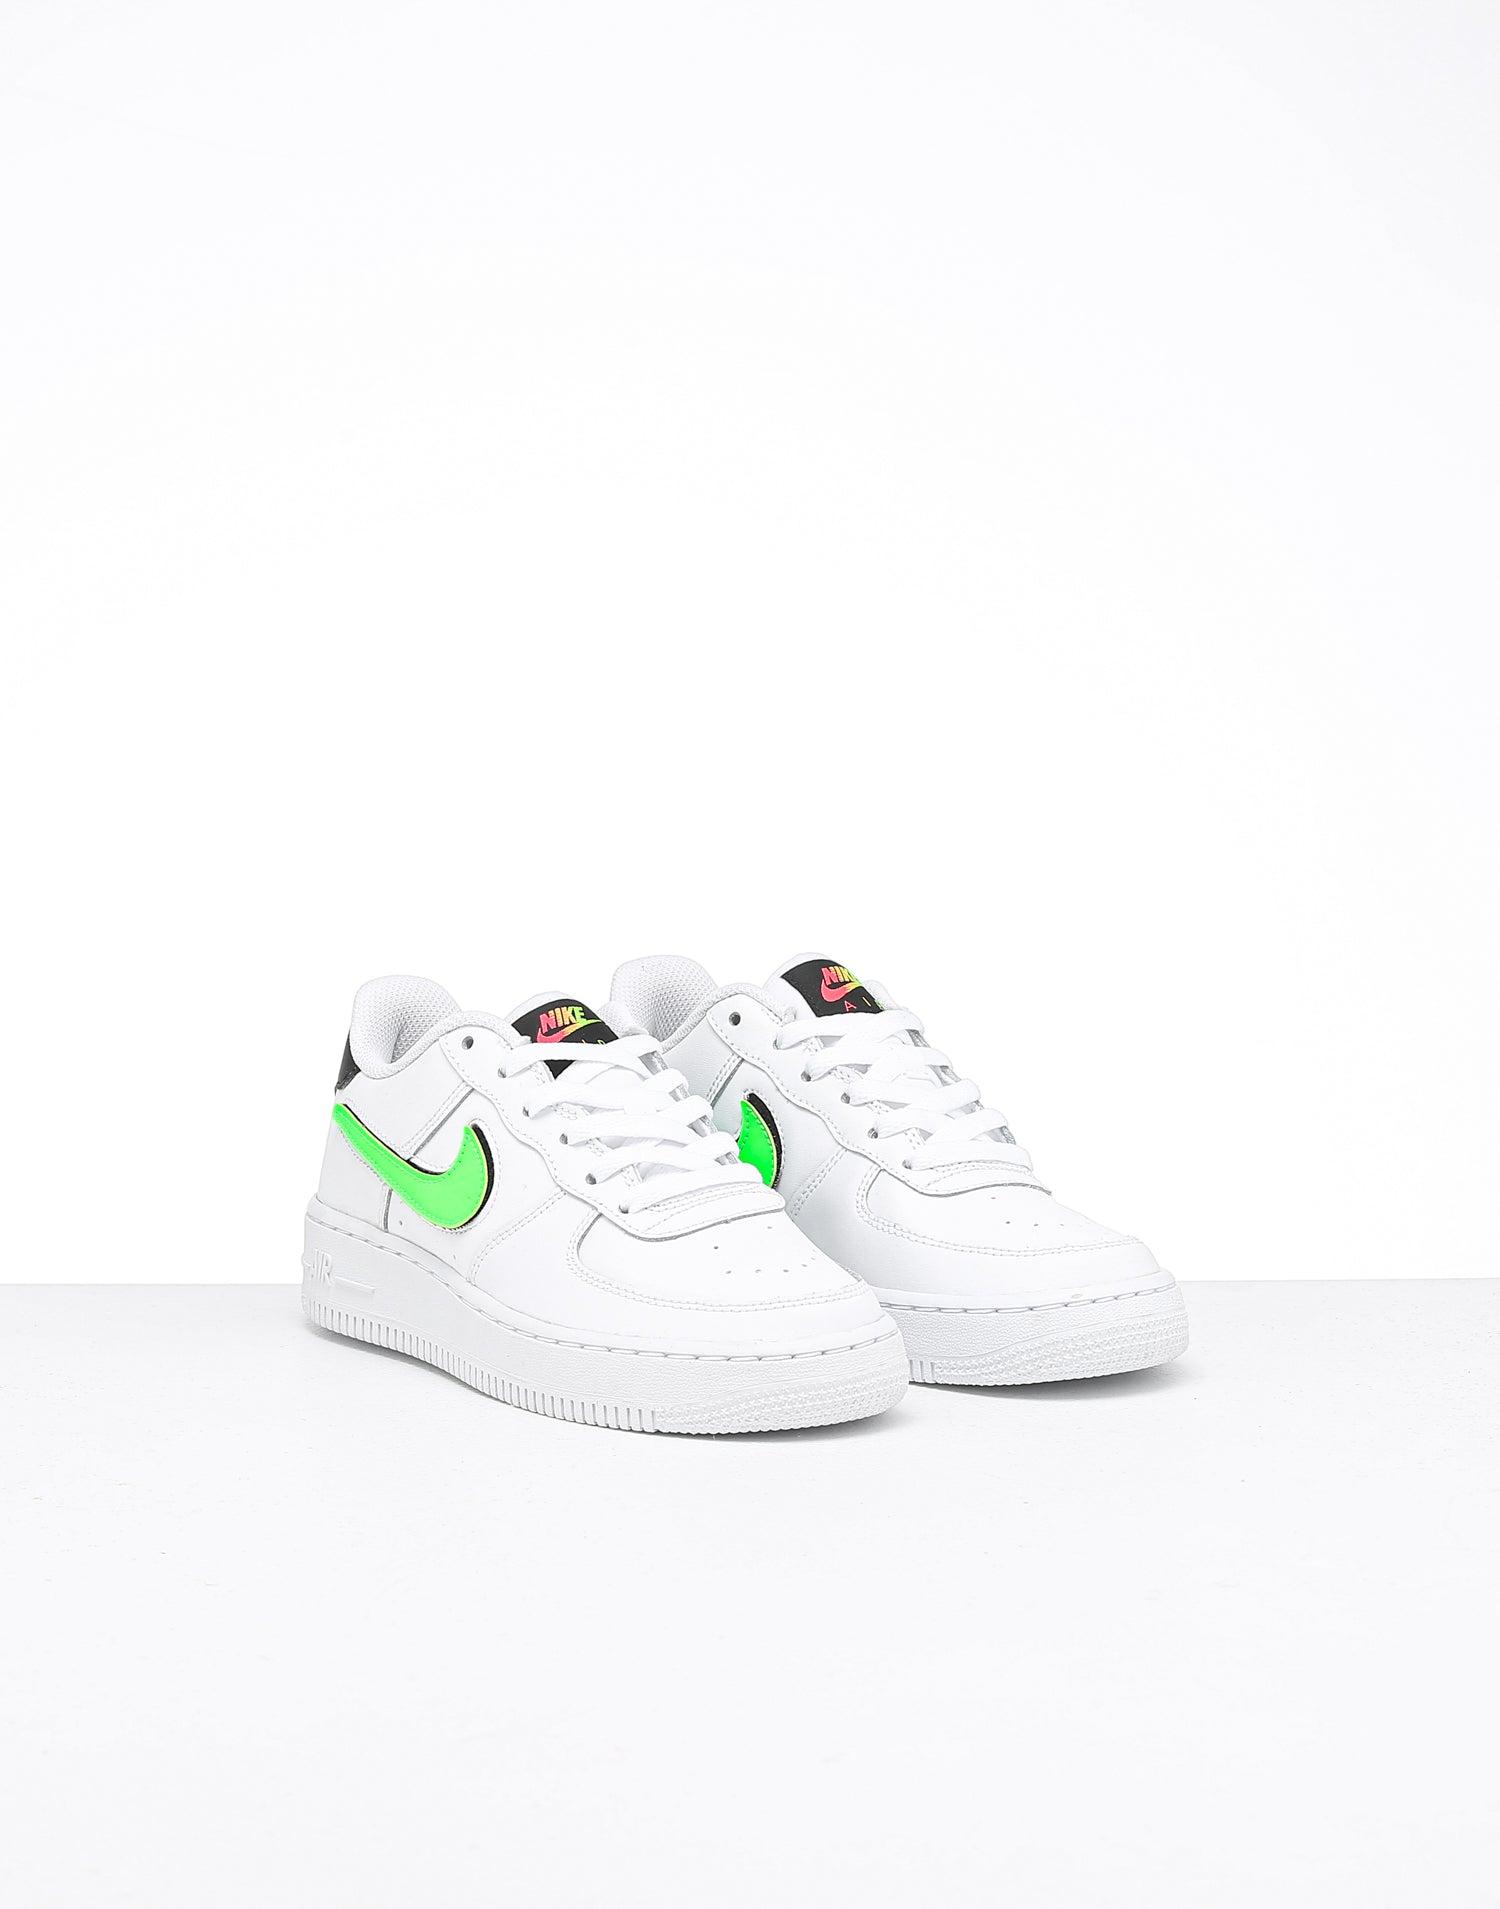 Nike Kids Air Force 1 Lv8 3 BlackBlack Black White